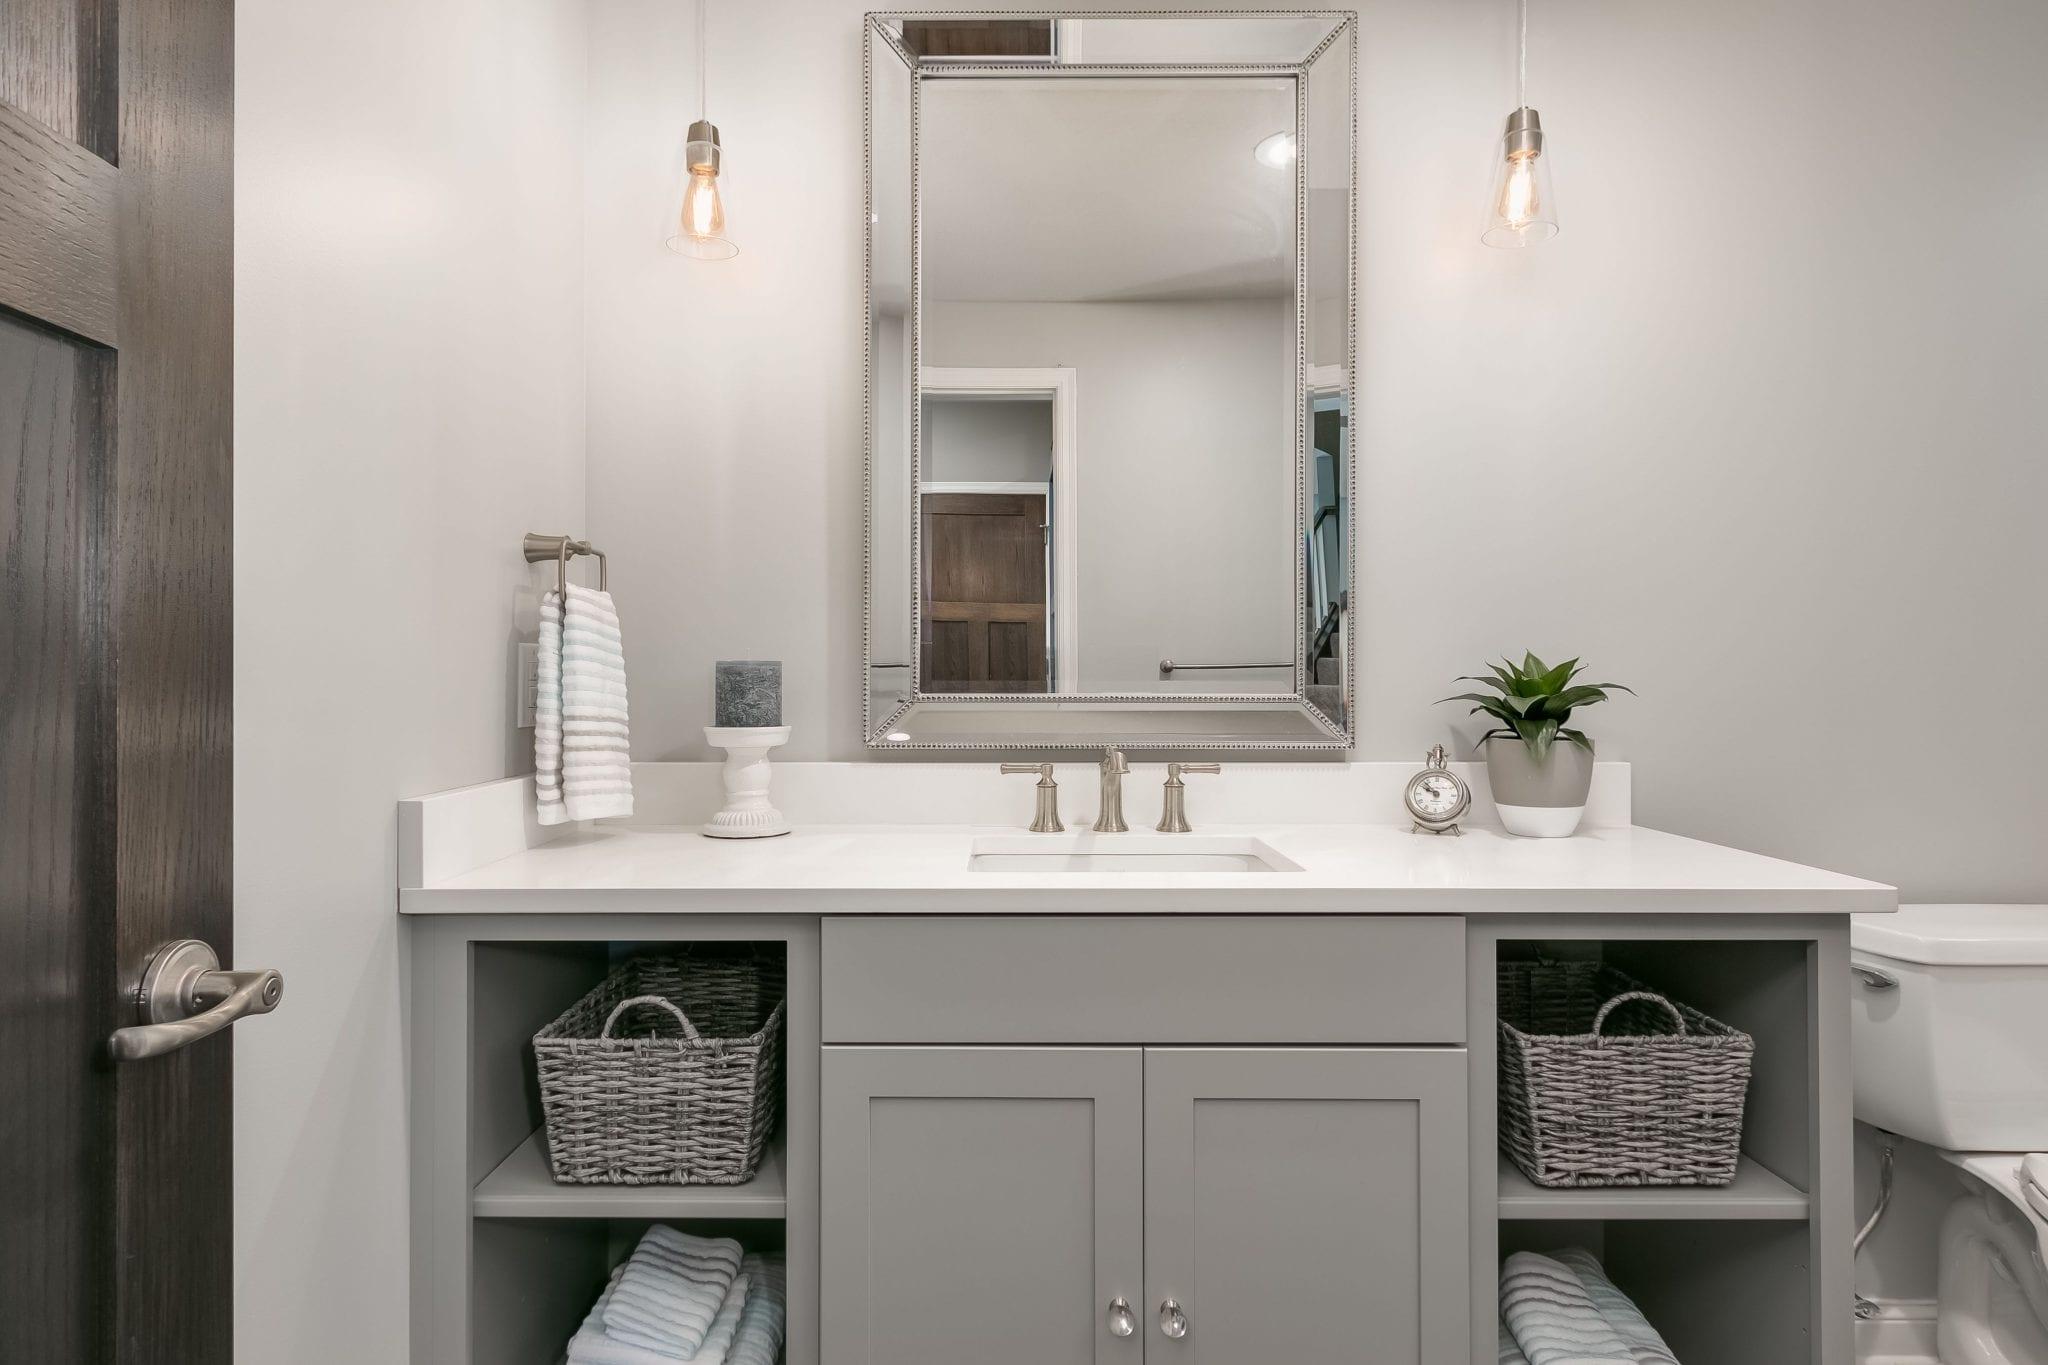 bathroom remodel | open cabinet space | fbc remodel